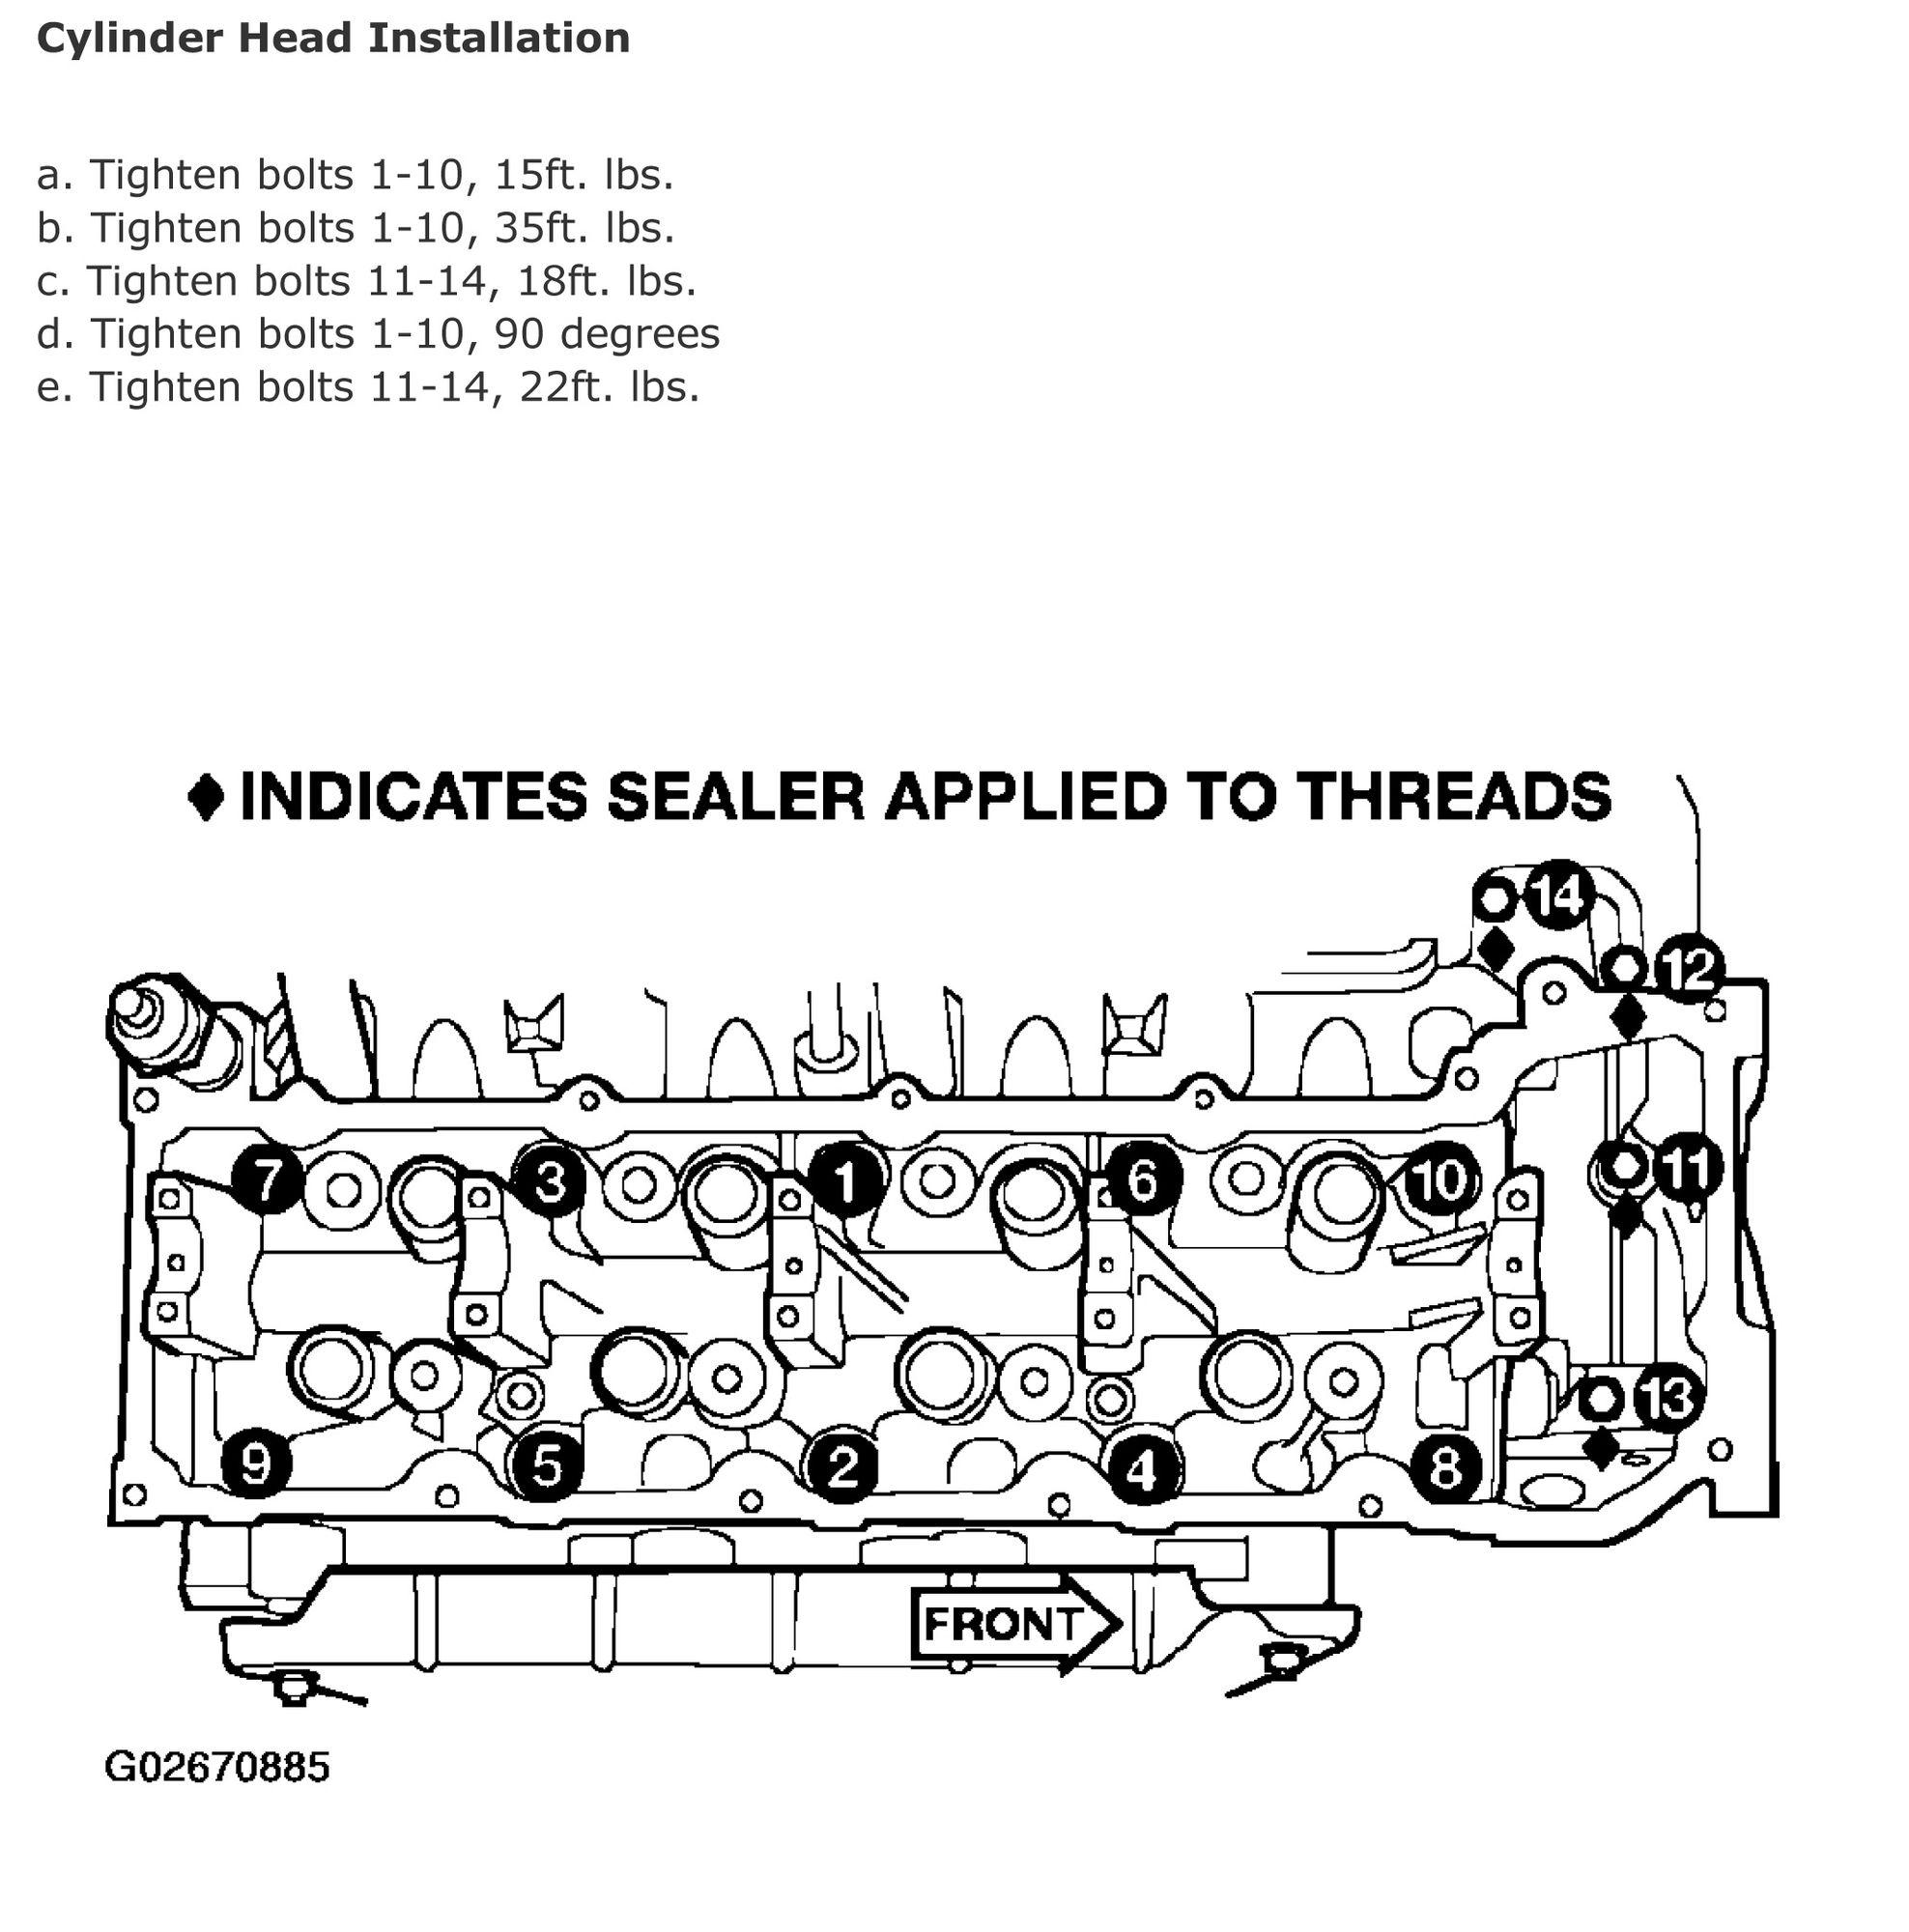 hight resolution of 2004 dodge durango 4 7 engine diagram dodge caravan